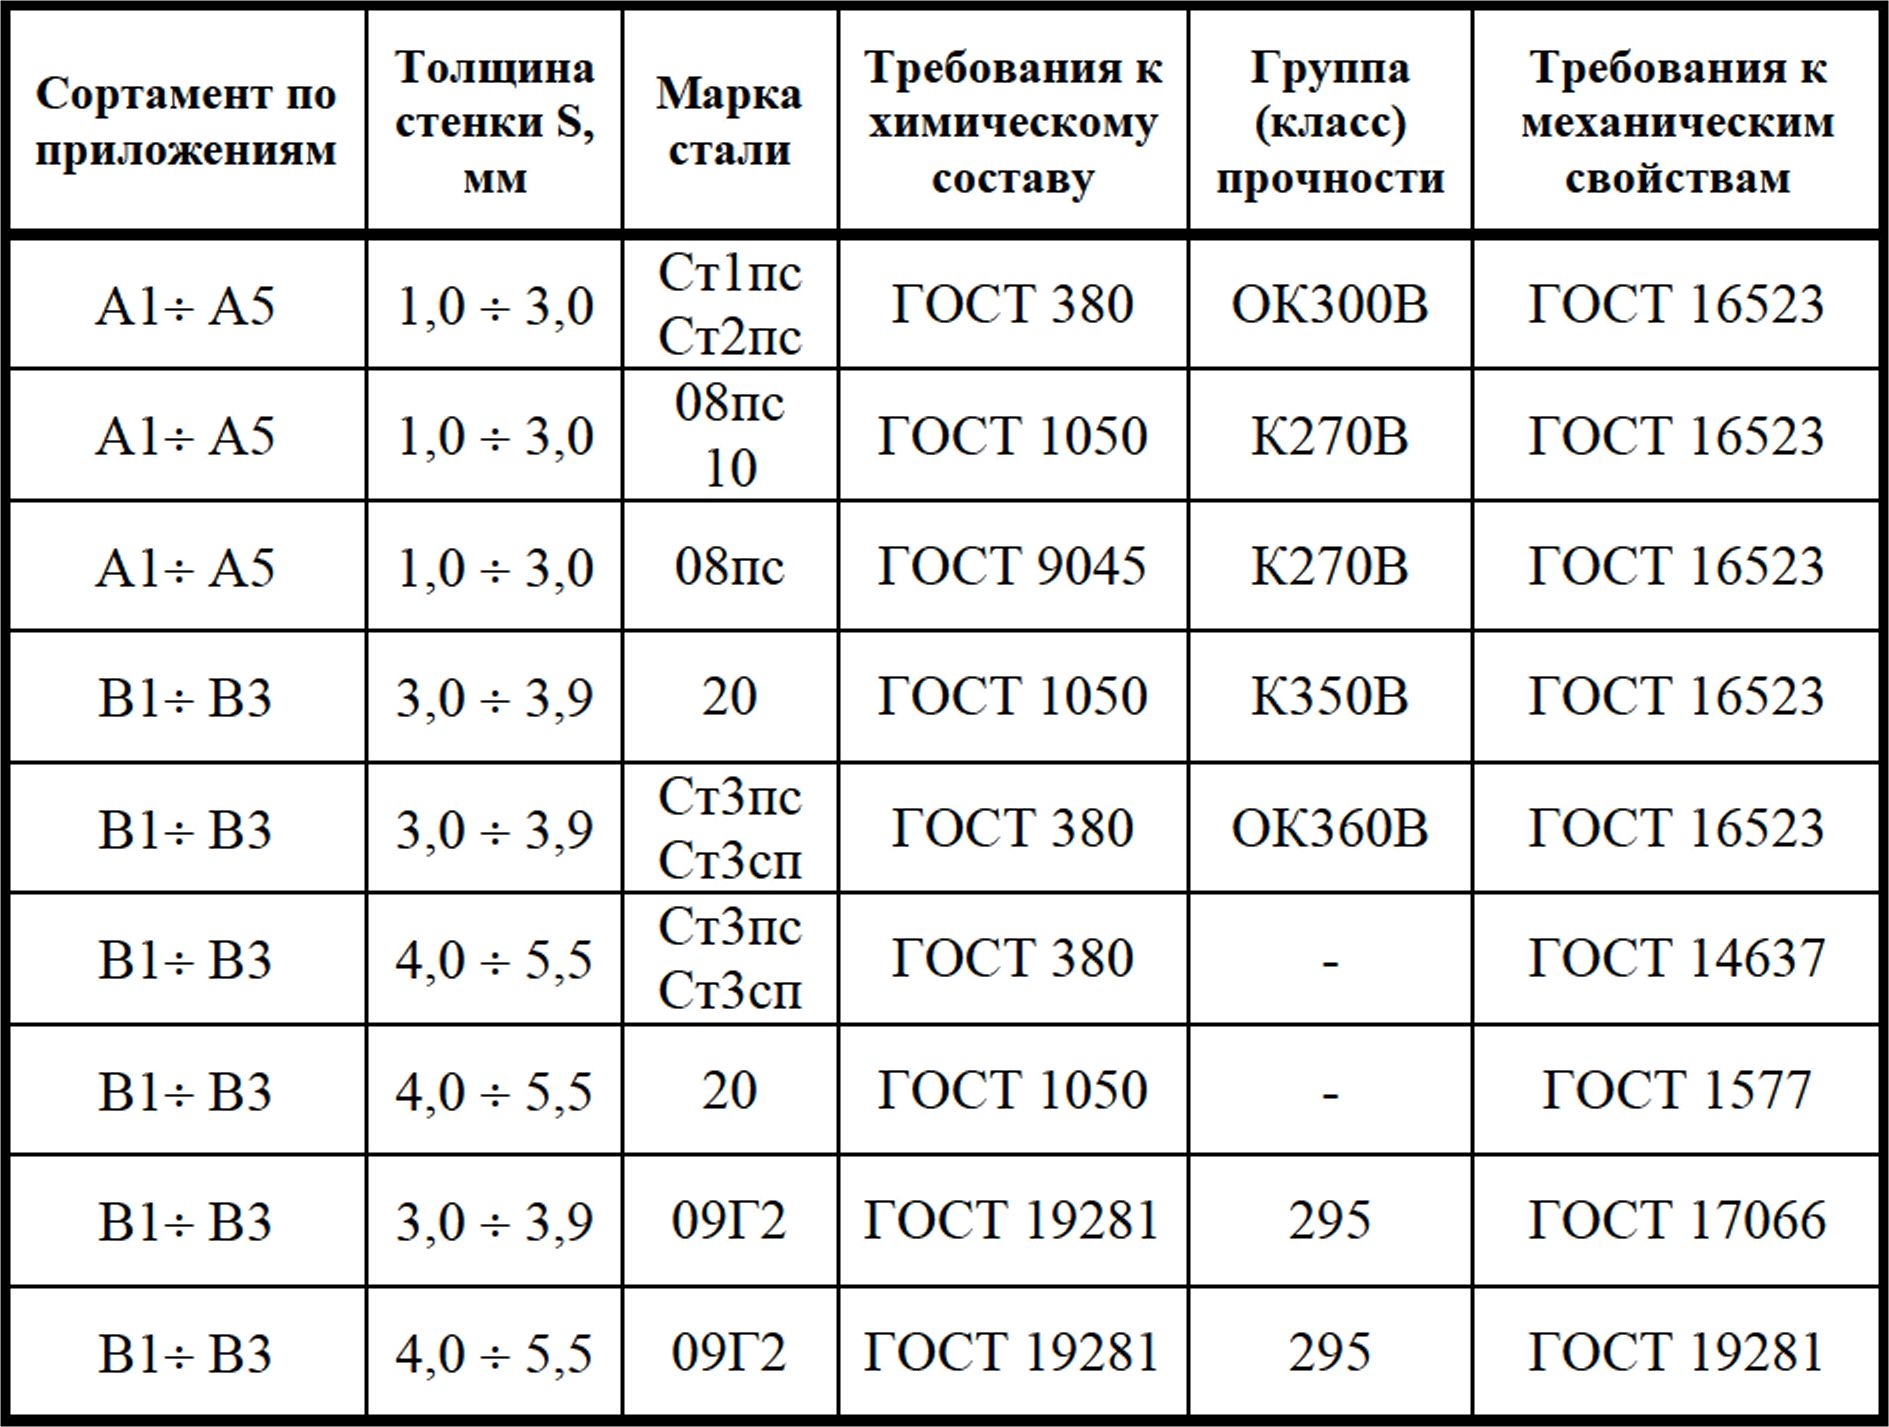 Сталь с345 - характеристика, аналоги